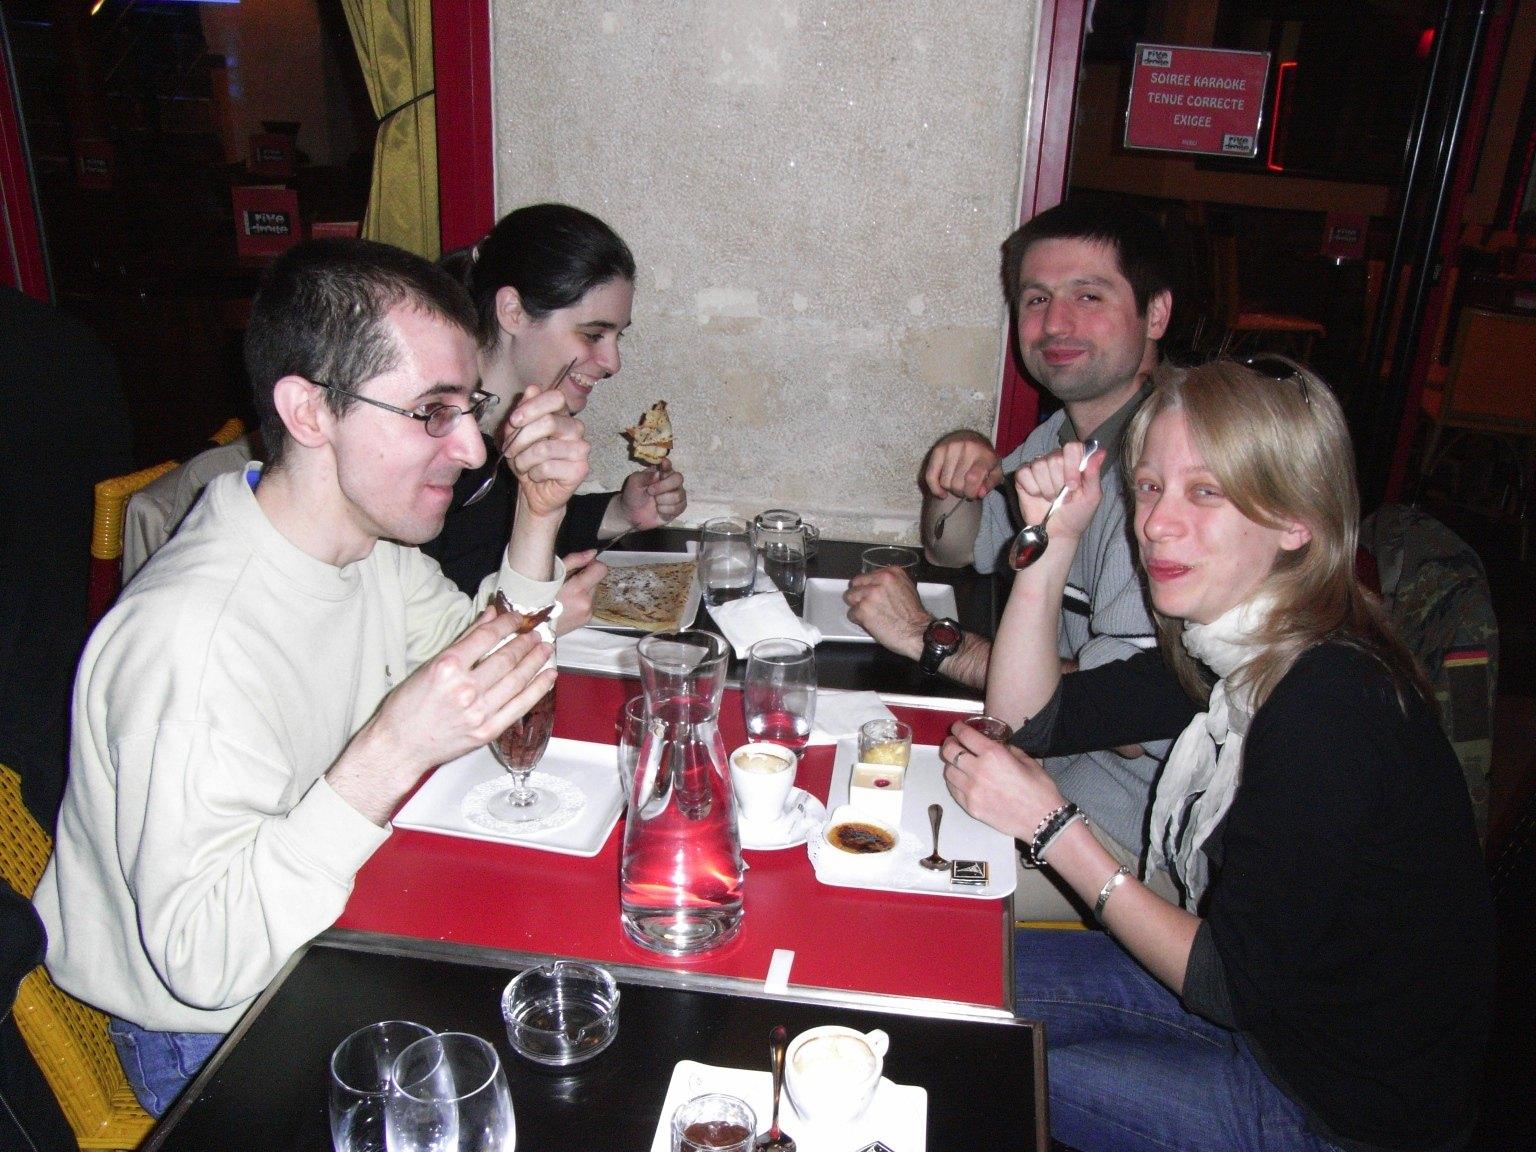 Photo 5 - Kenda, Kardass, maitreIkrit et Mara